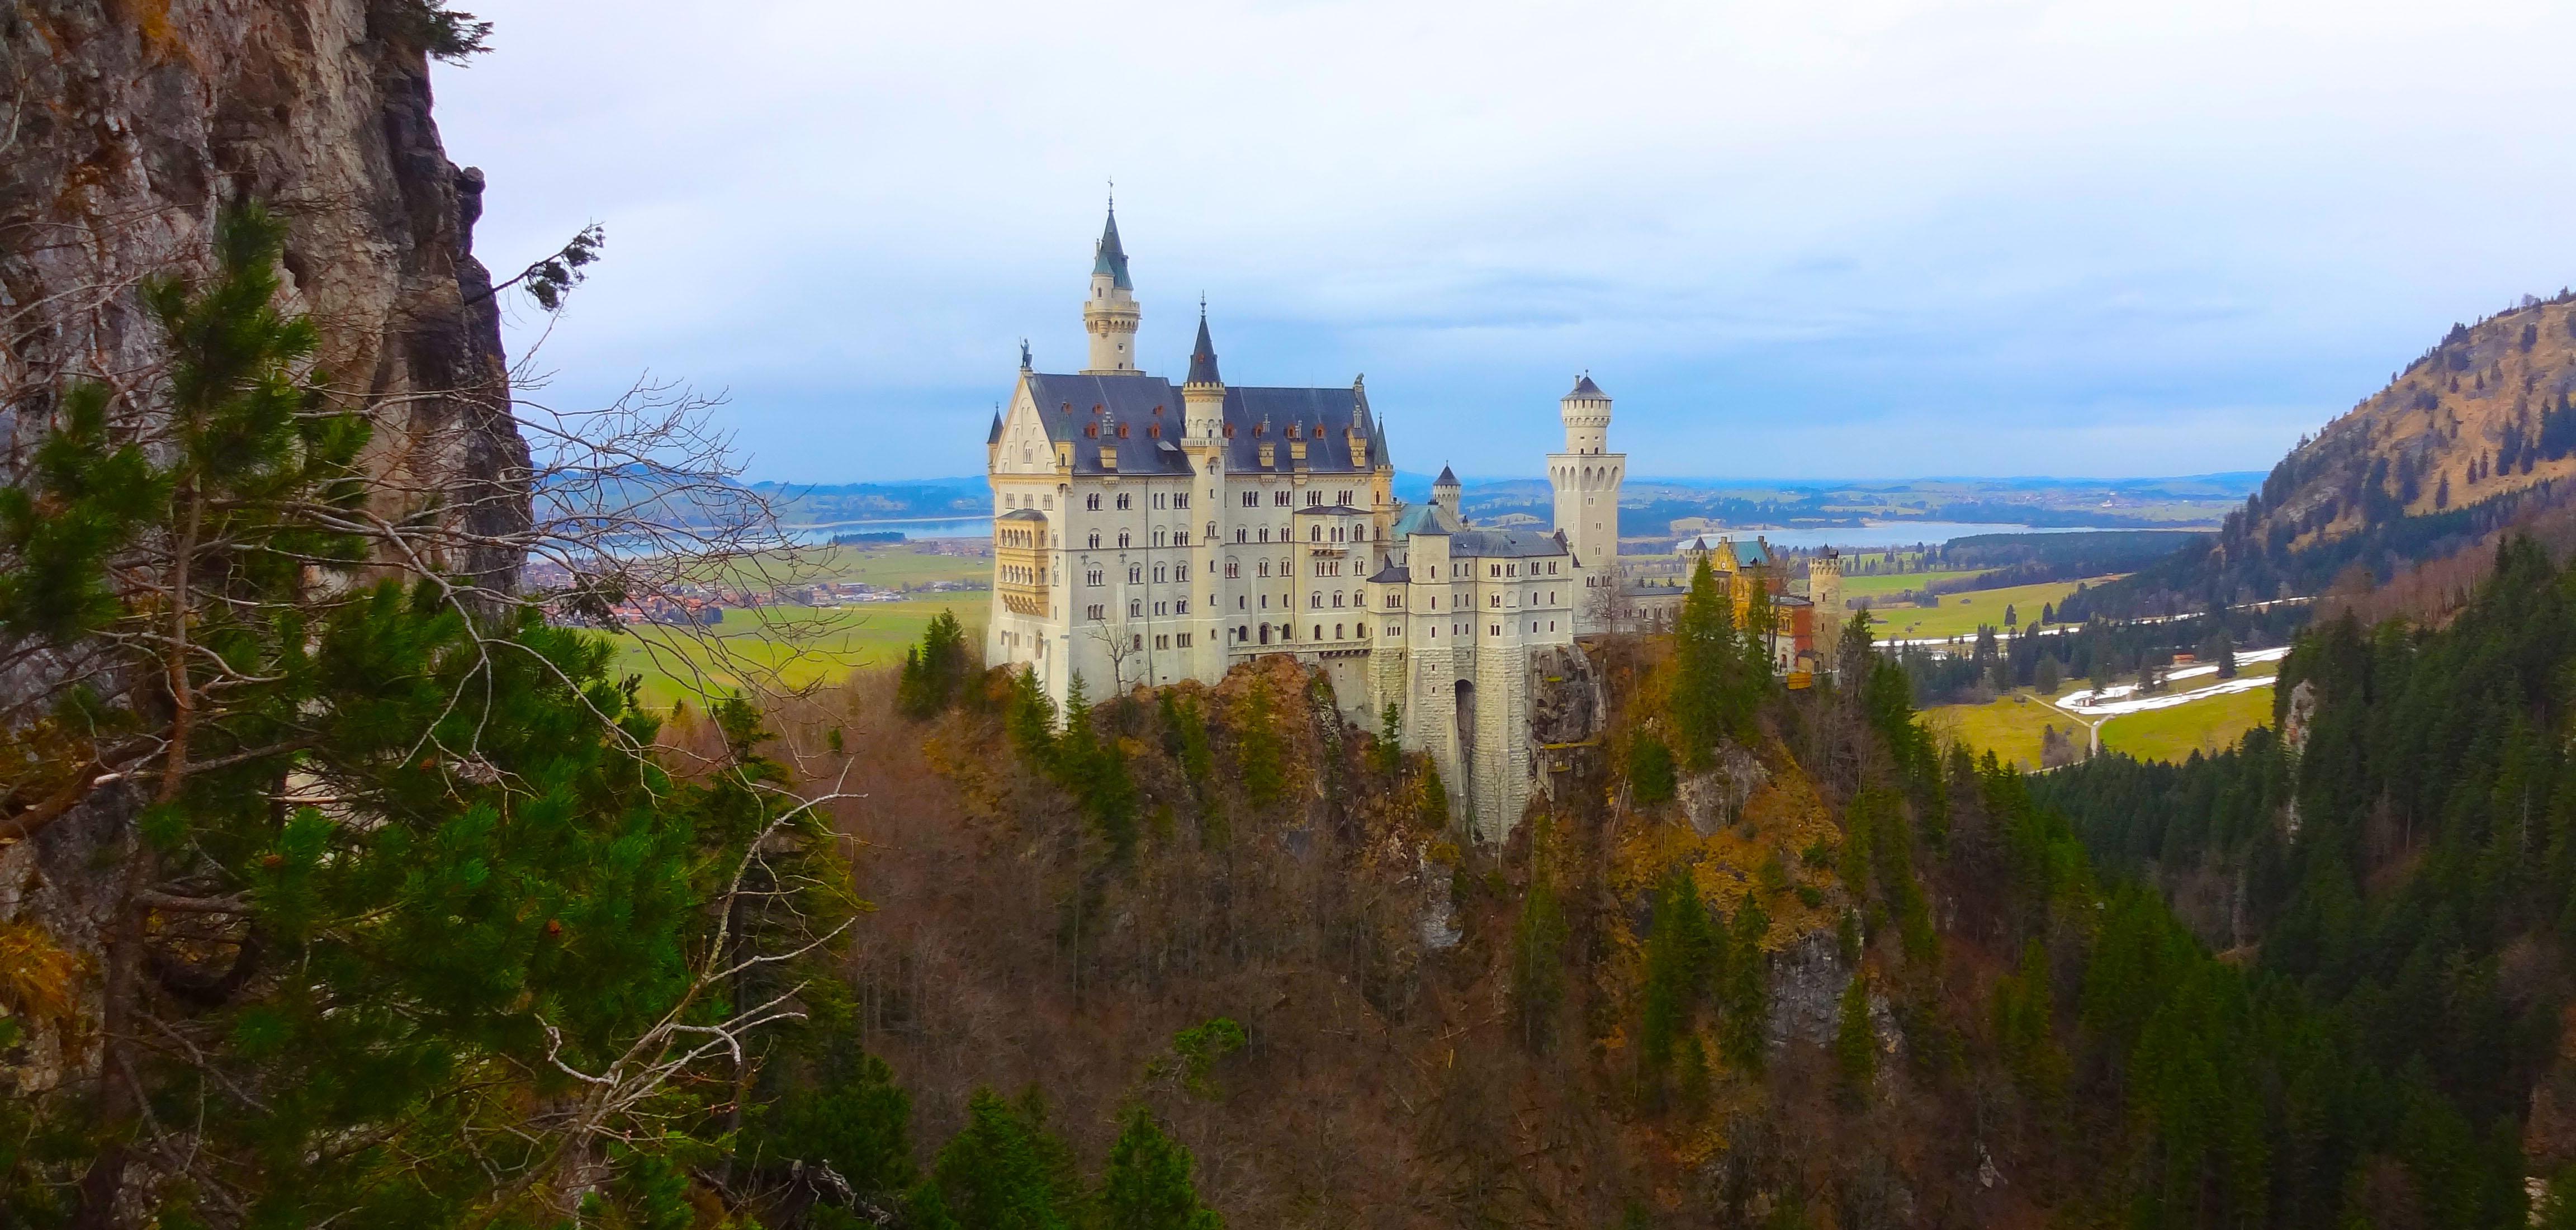 CAPA 1 - Neuschwanstein: o castelo de contos de fadas da Baviera